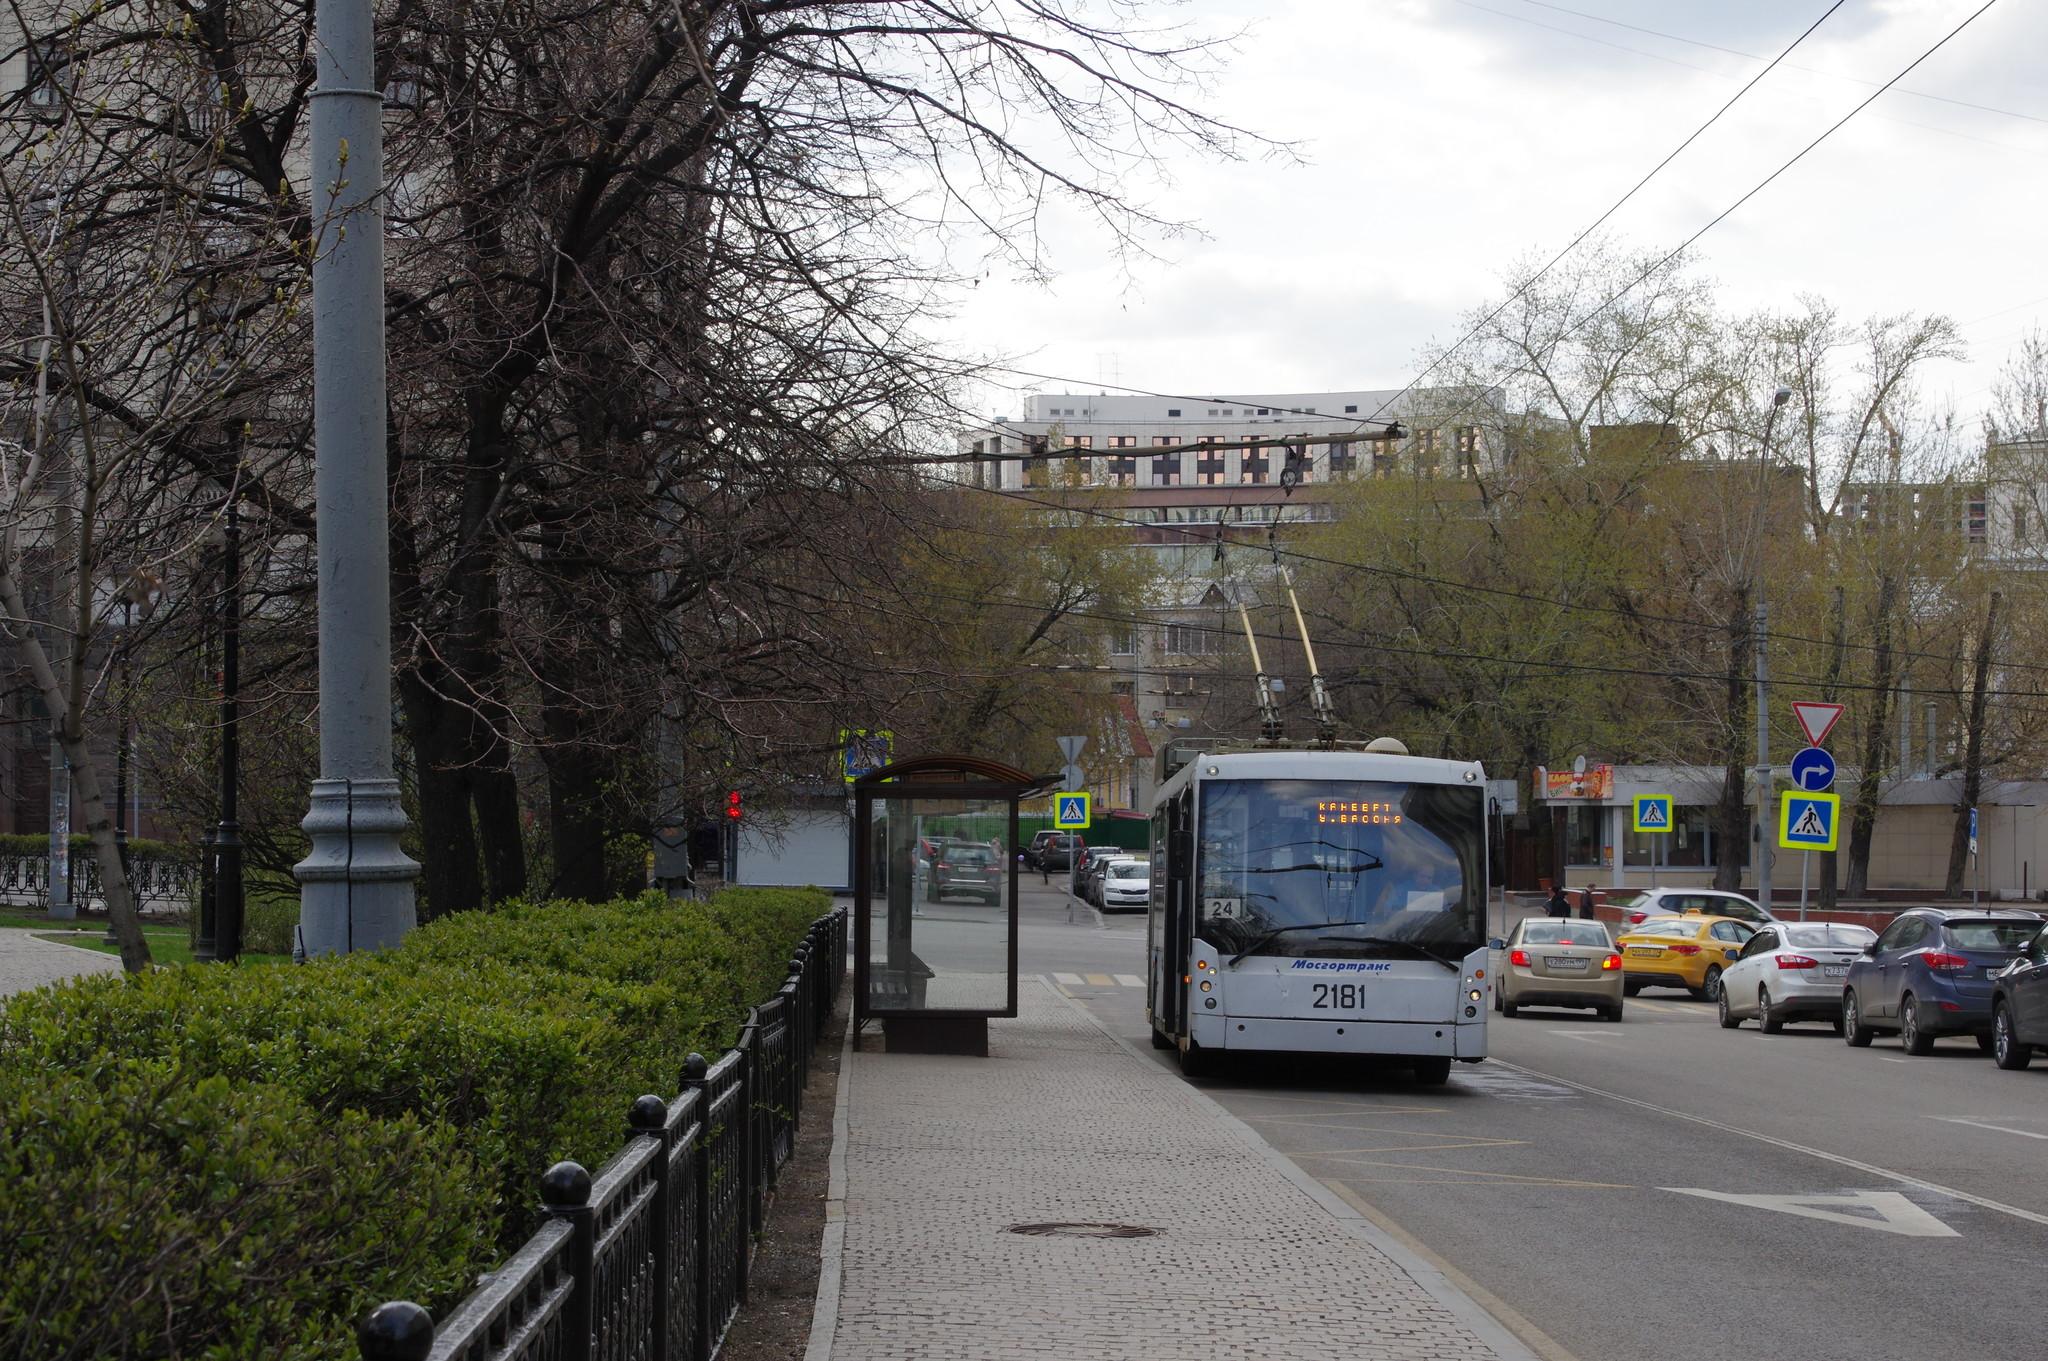 Тролейбус № 2181 (Модель: Тролза-5265.00 «Мегаполис») на маршруте № 24